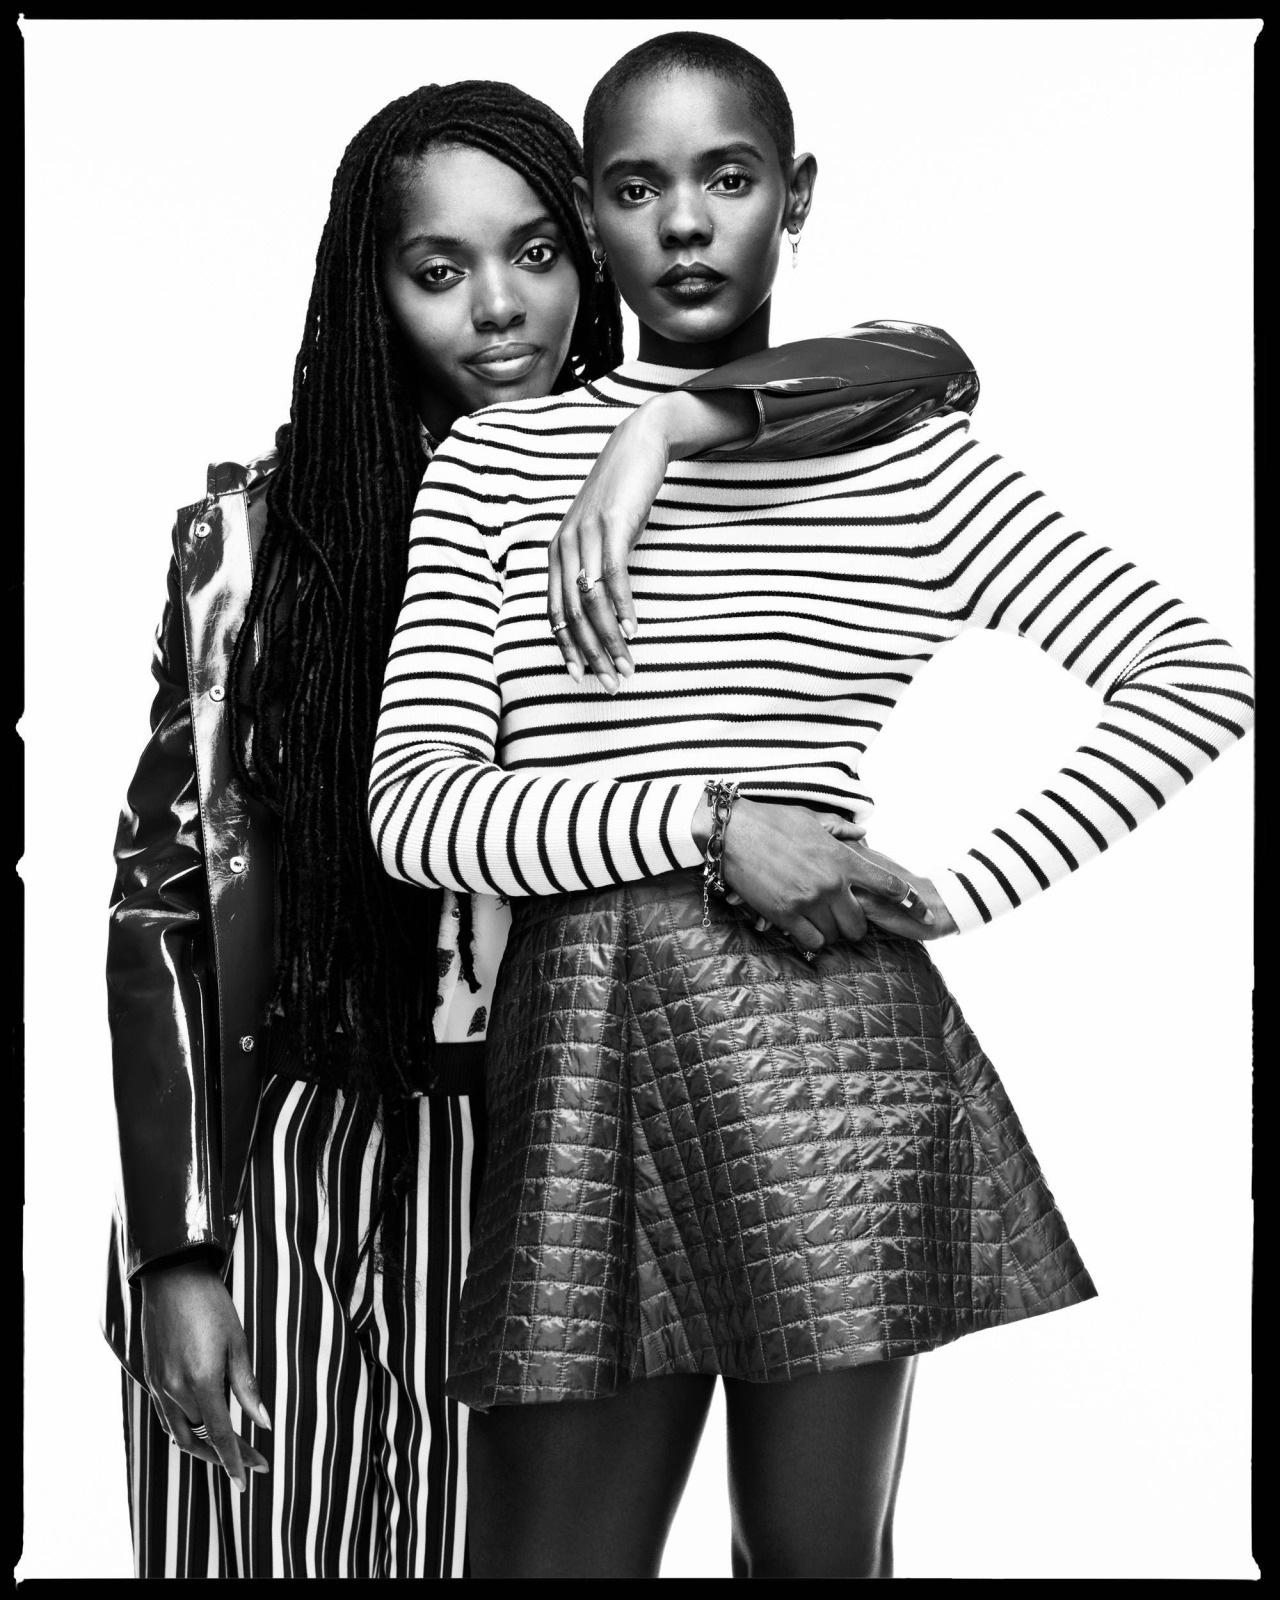 Black Fashion, Black Fashion Designers, Stella Jean, Darlene and Lizzy Okpo, Duro Olowu, Maxwell Osborne, Jessie Adore, Olivier Rousteing, Tracy Reese, KOLUMN Magazine, KOLUMN